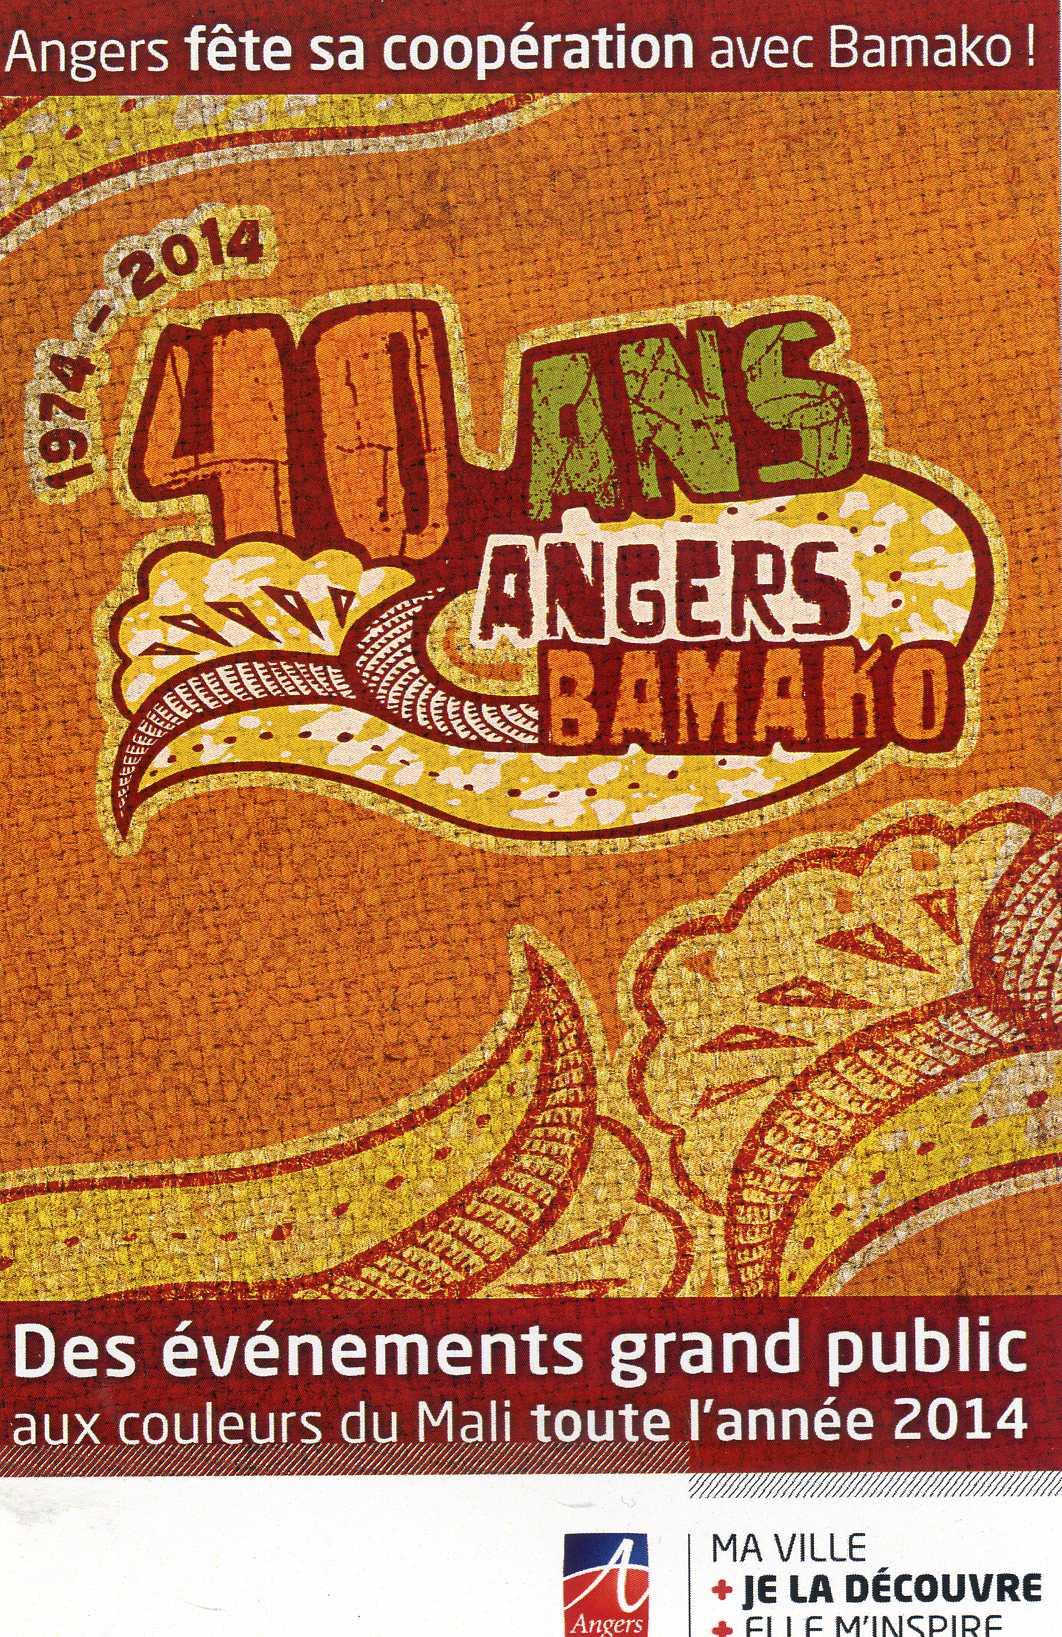 Calendrier Evénements 40 ans du jumelage Angers-Bamako